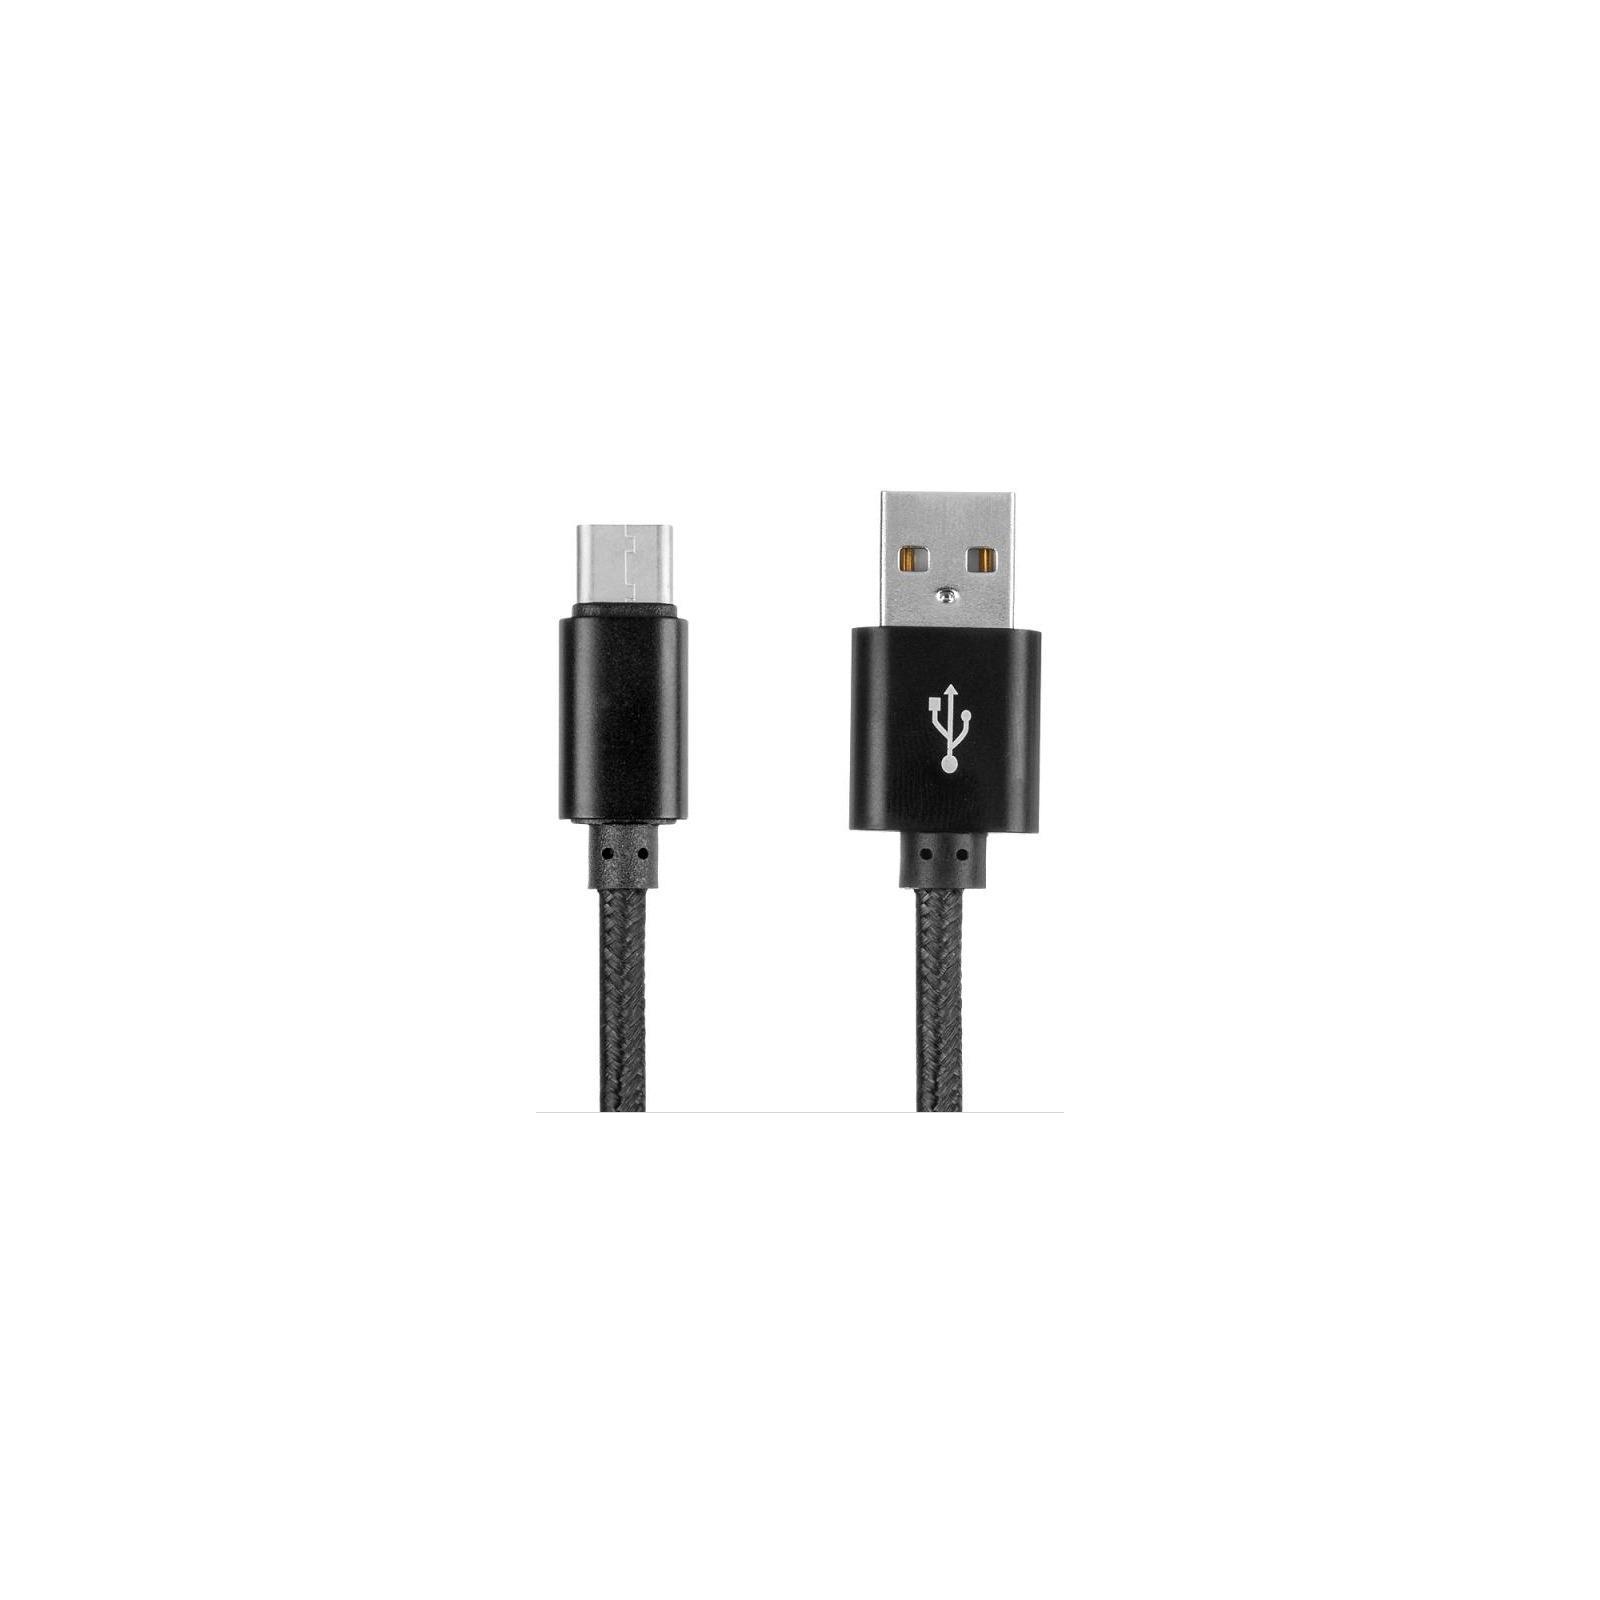 Дата кабель USB 2.0 AM to Type-C 1.5m DC-TC-152NR black Greenwave (R0015190)